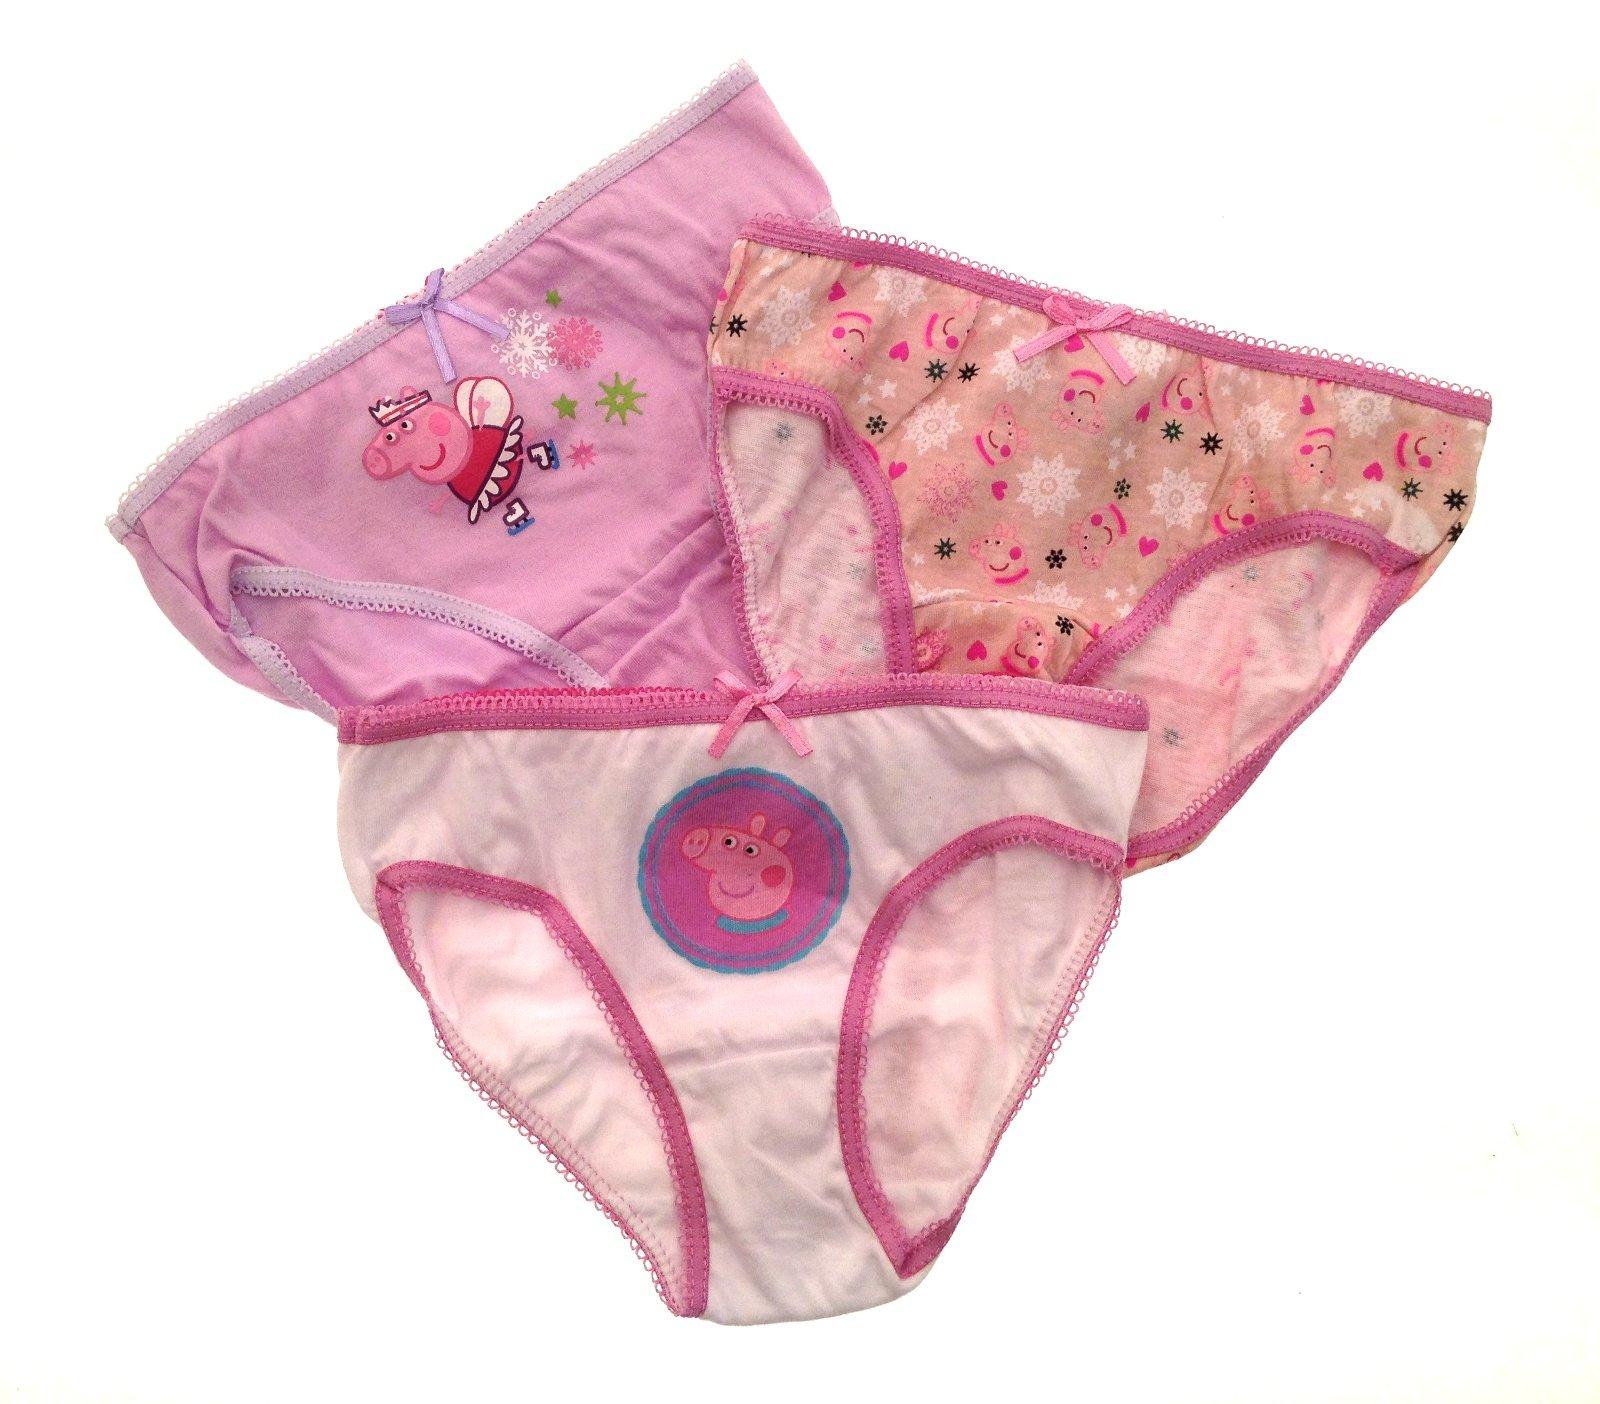 GIRLS KNICKERS BRIEFS PANTS DISNEY PEPPA PIG PINK 3 PACK 100/% COTTON £4.50